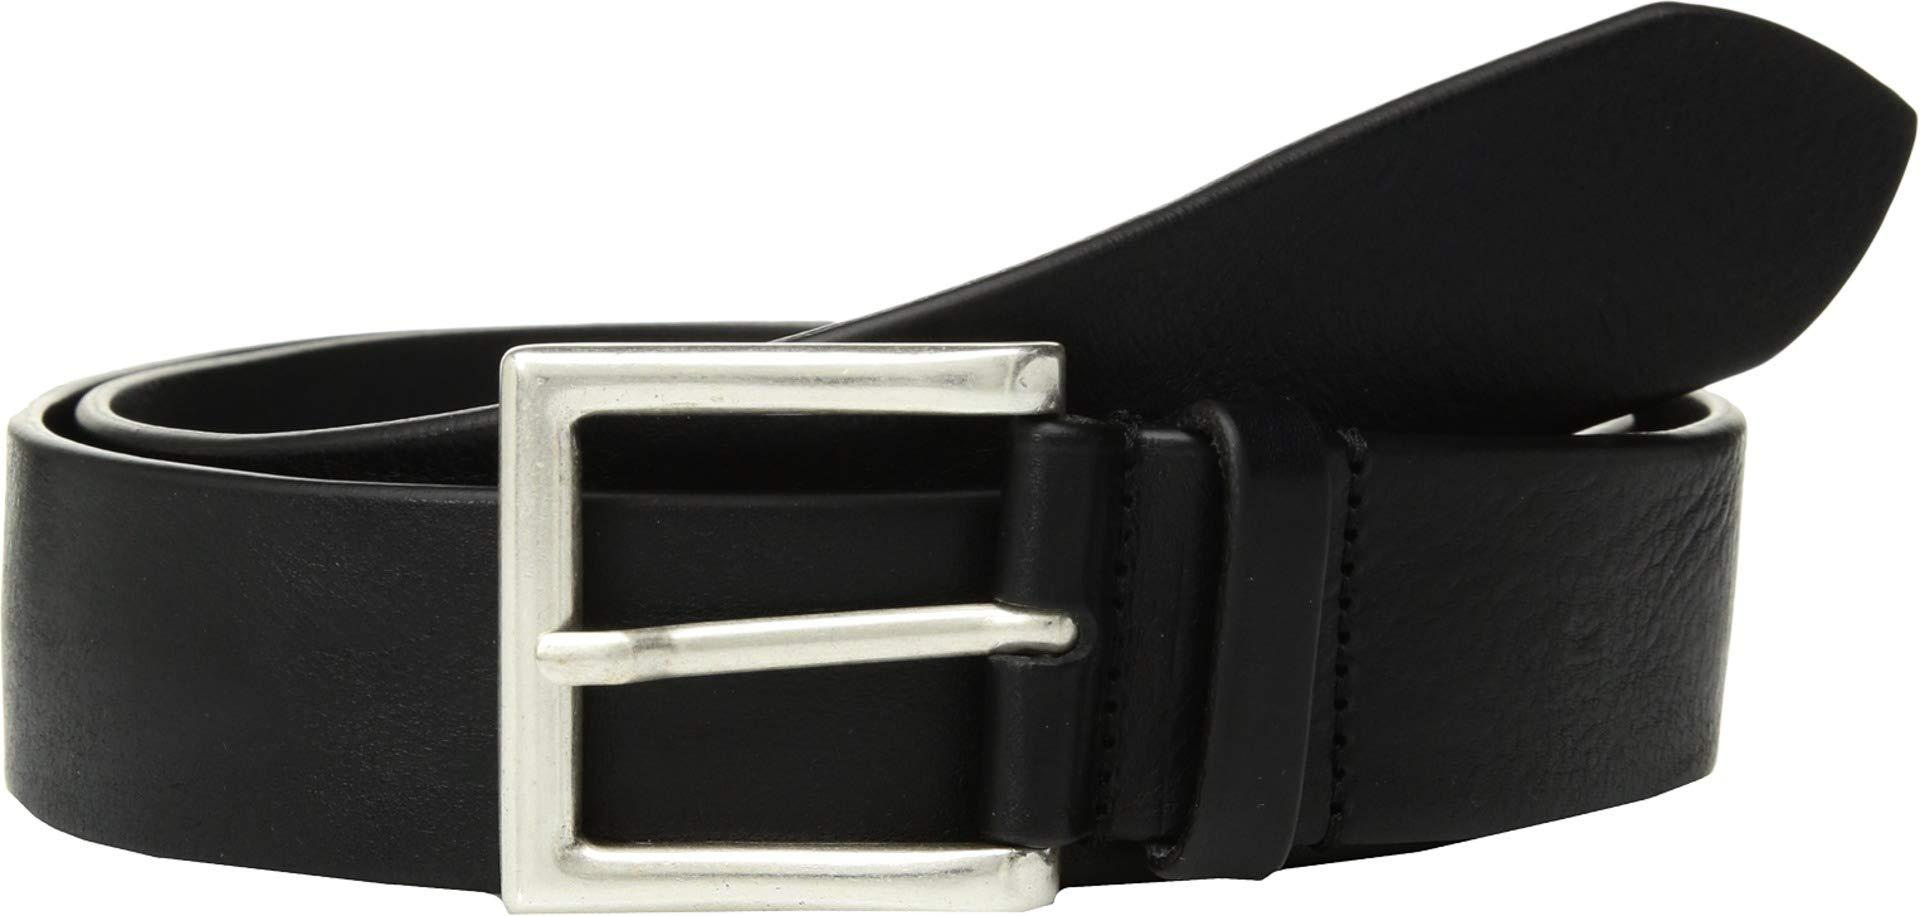 To Boot New York Men's Belt (40mm) Black 38